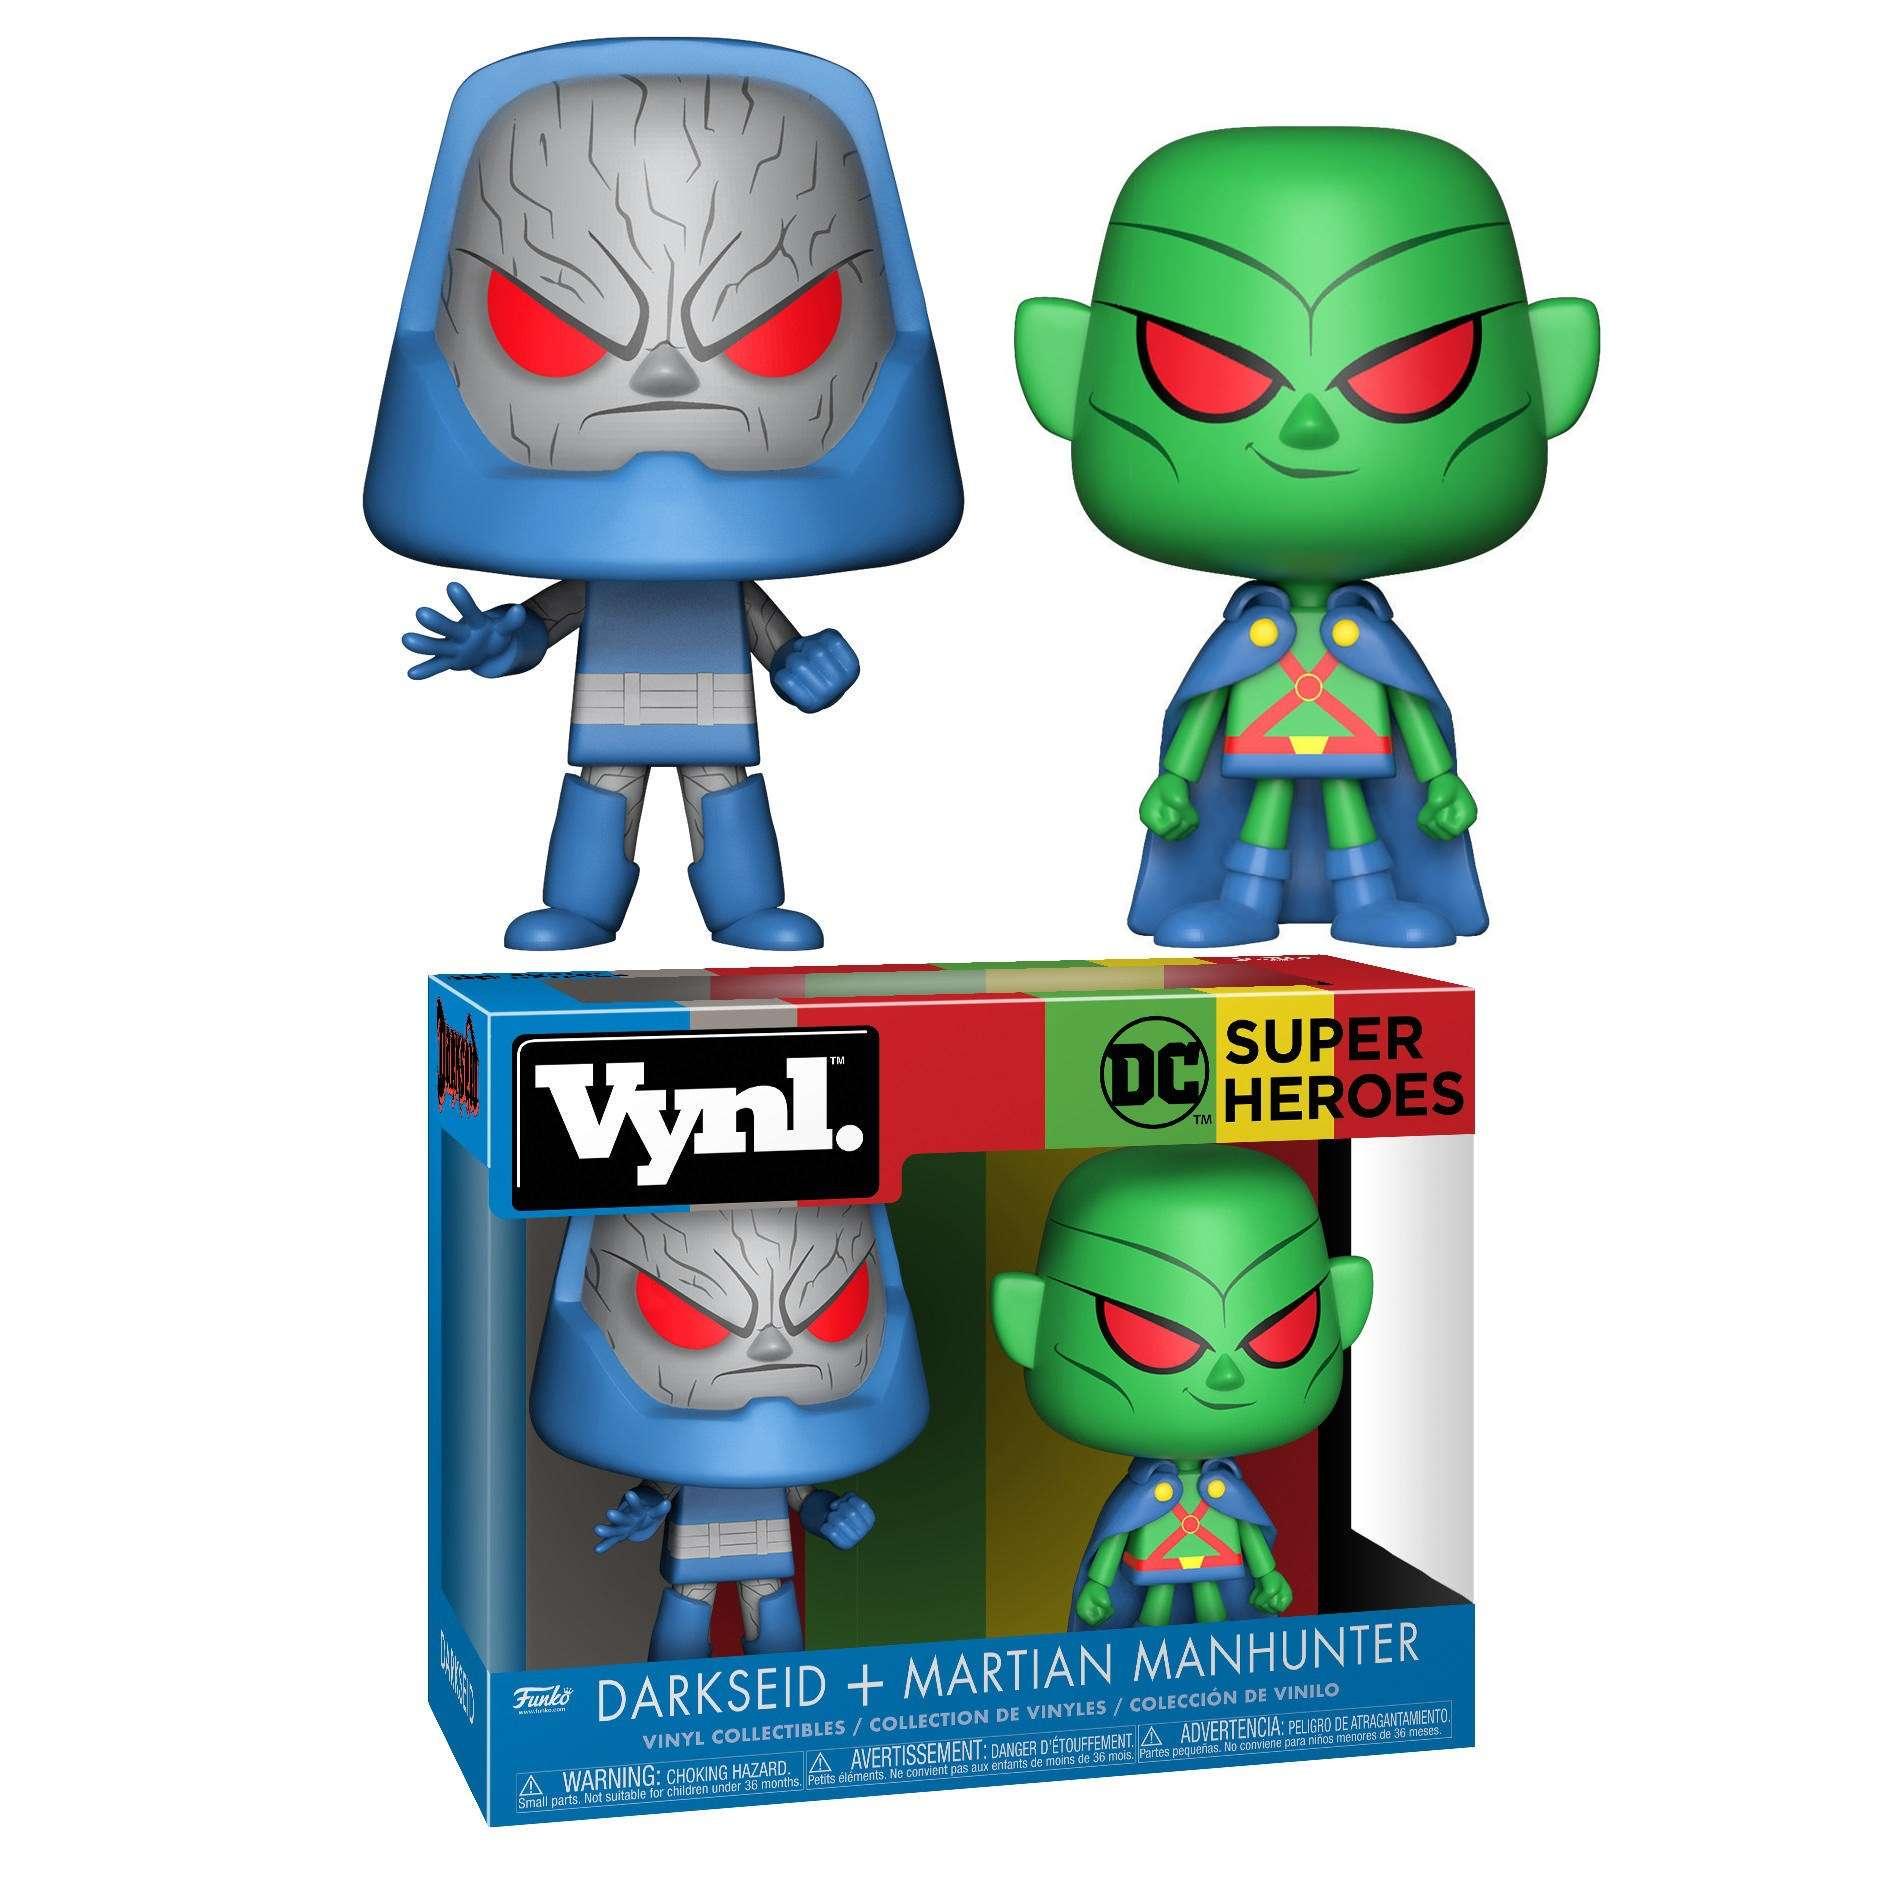 Vynl: DC Comics - Darkseid + Martian Manhunter Photo